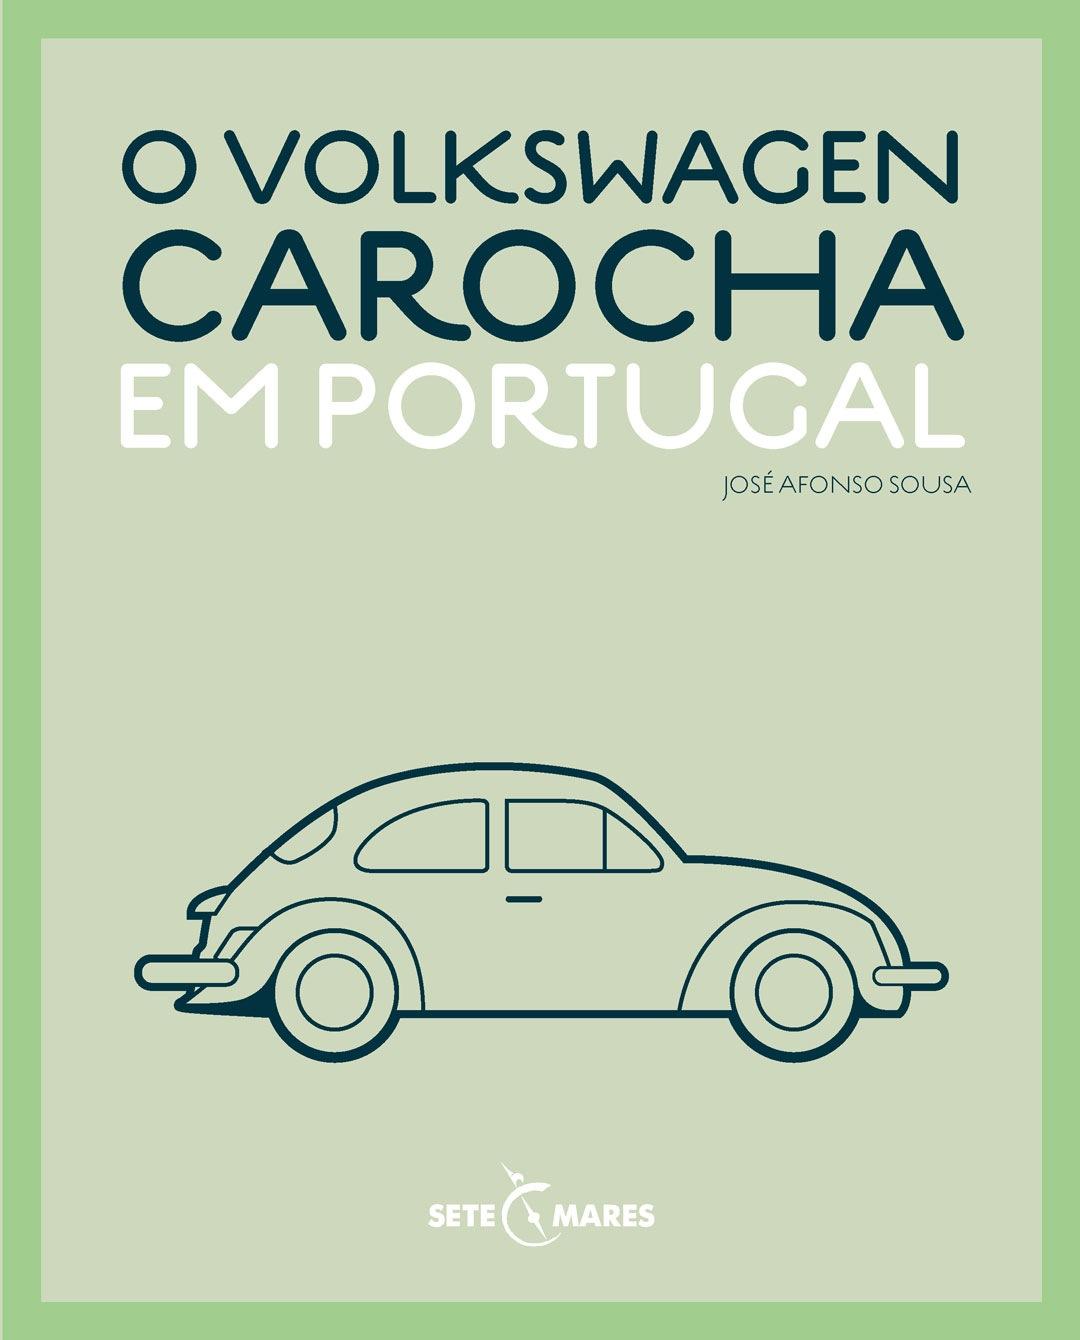 O Volkswagen Carocha em Portugal